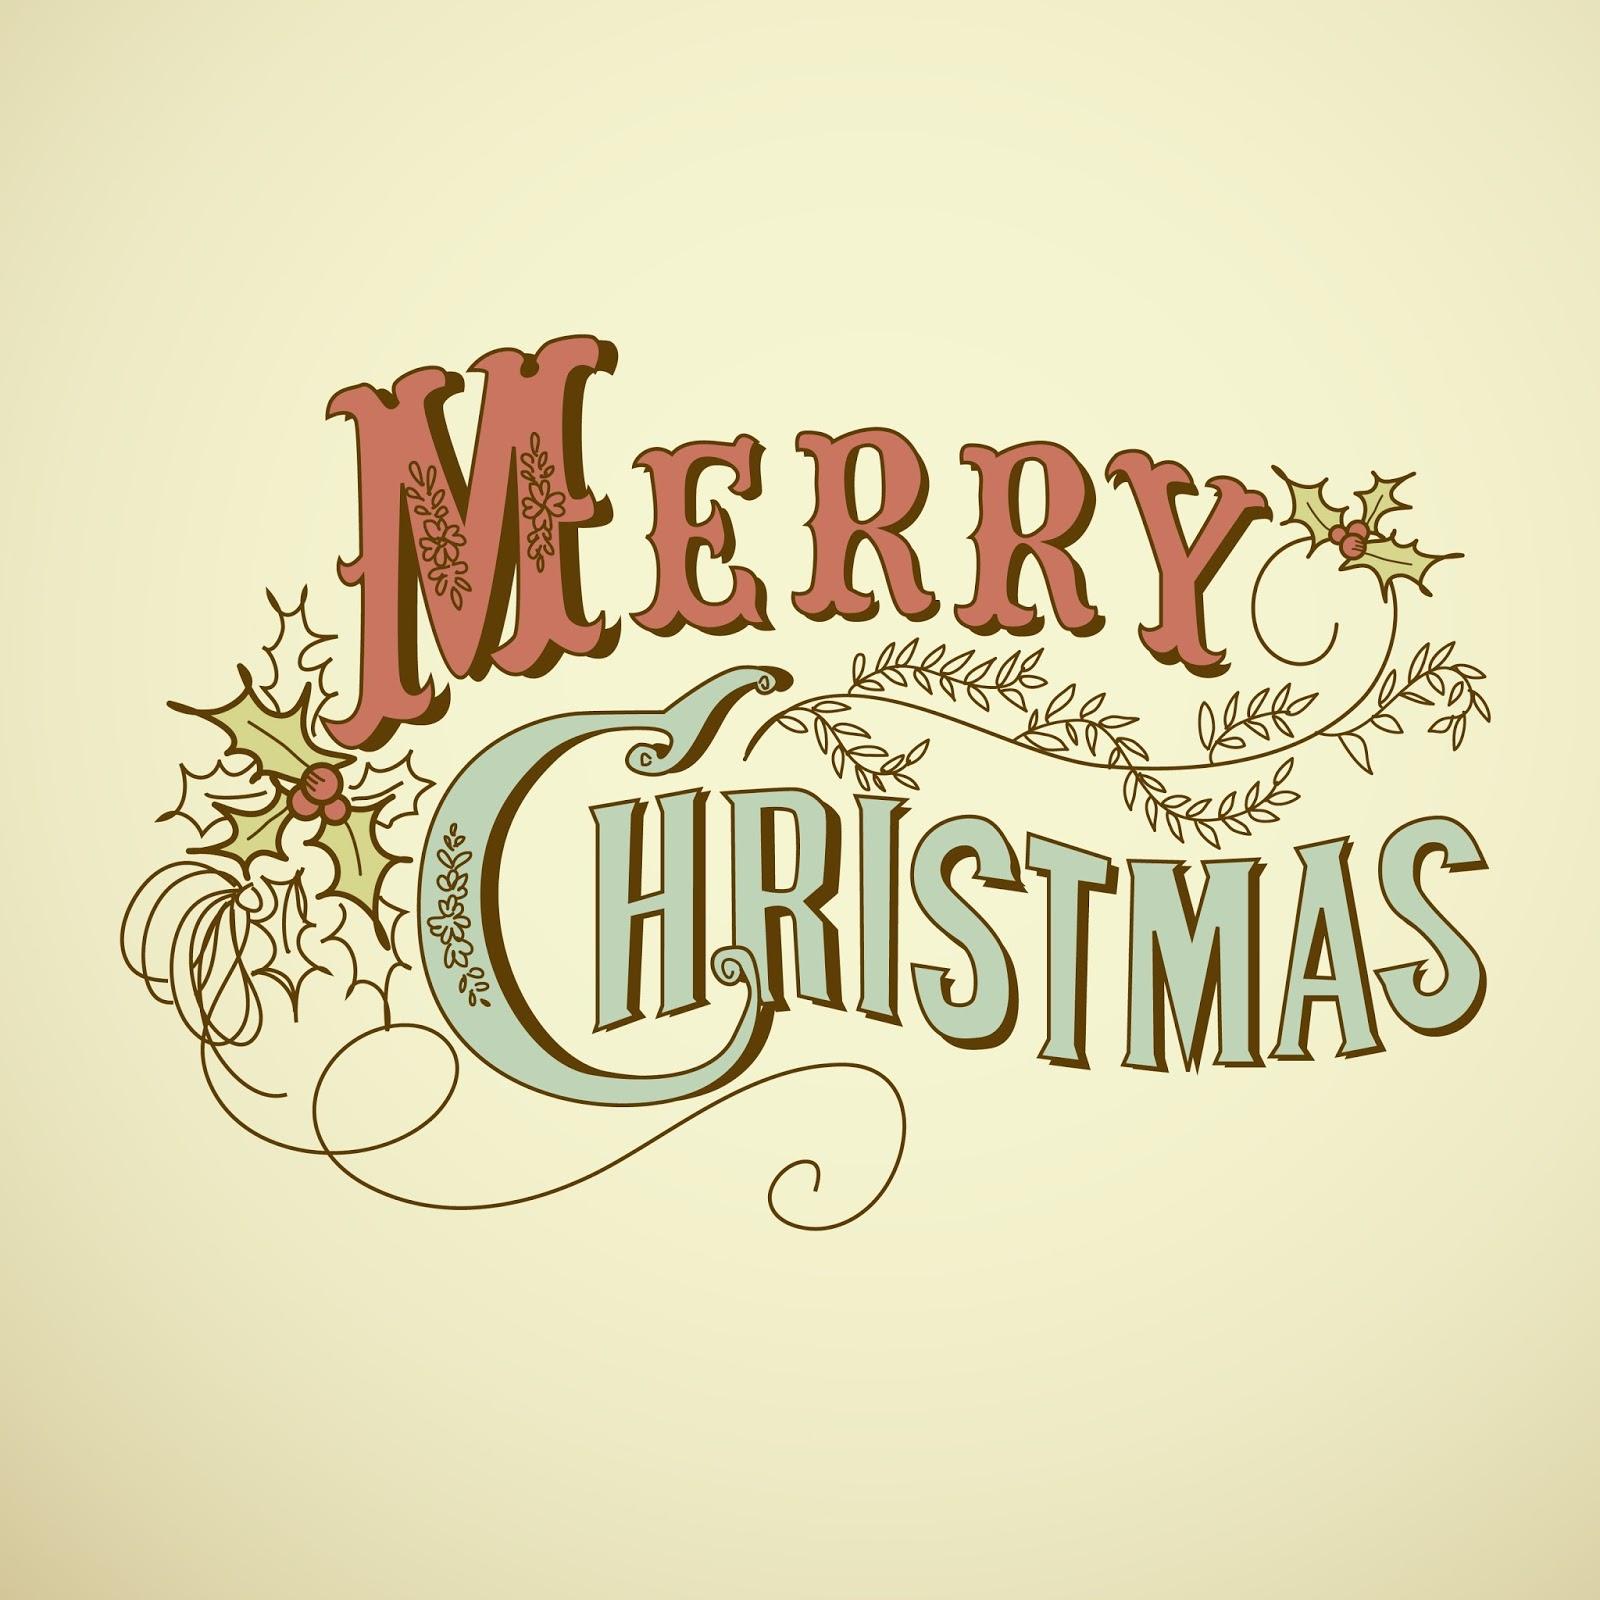 The Christmas Lyrics Poem – Words & Music